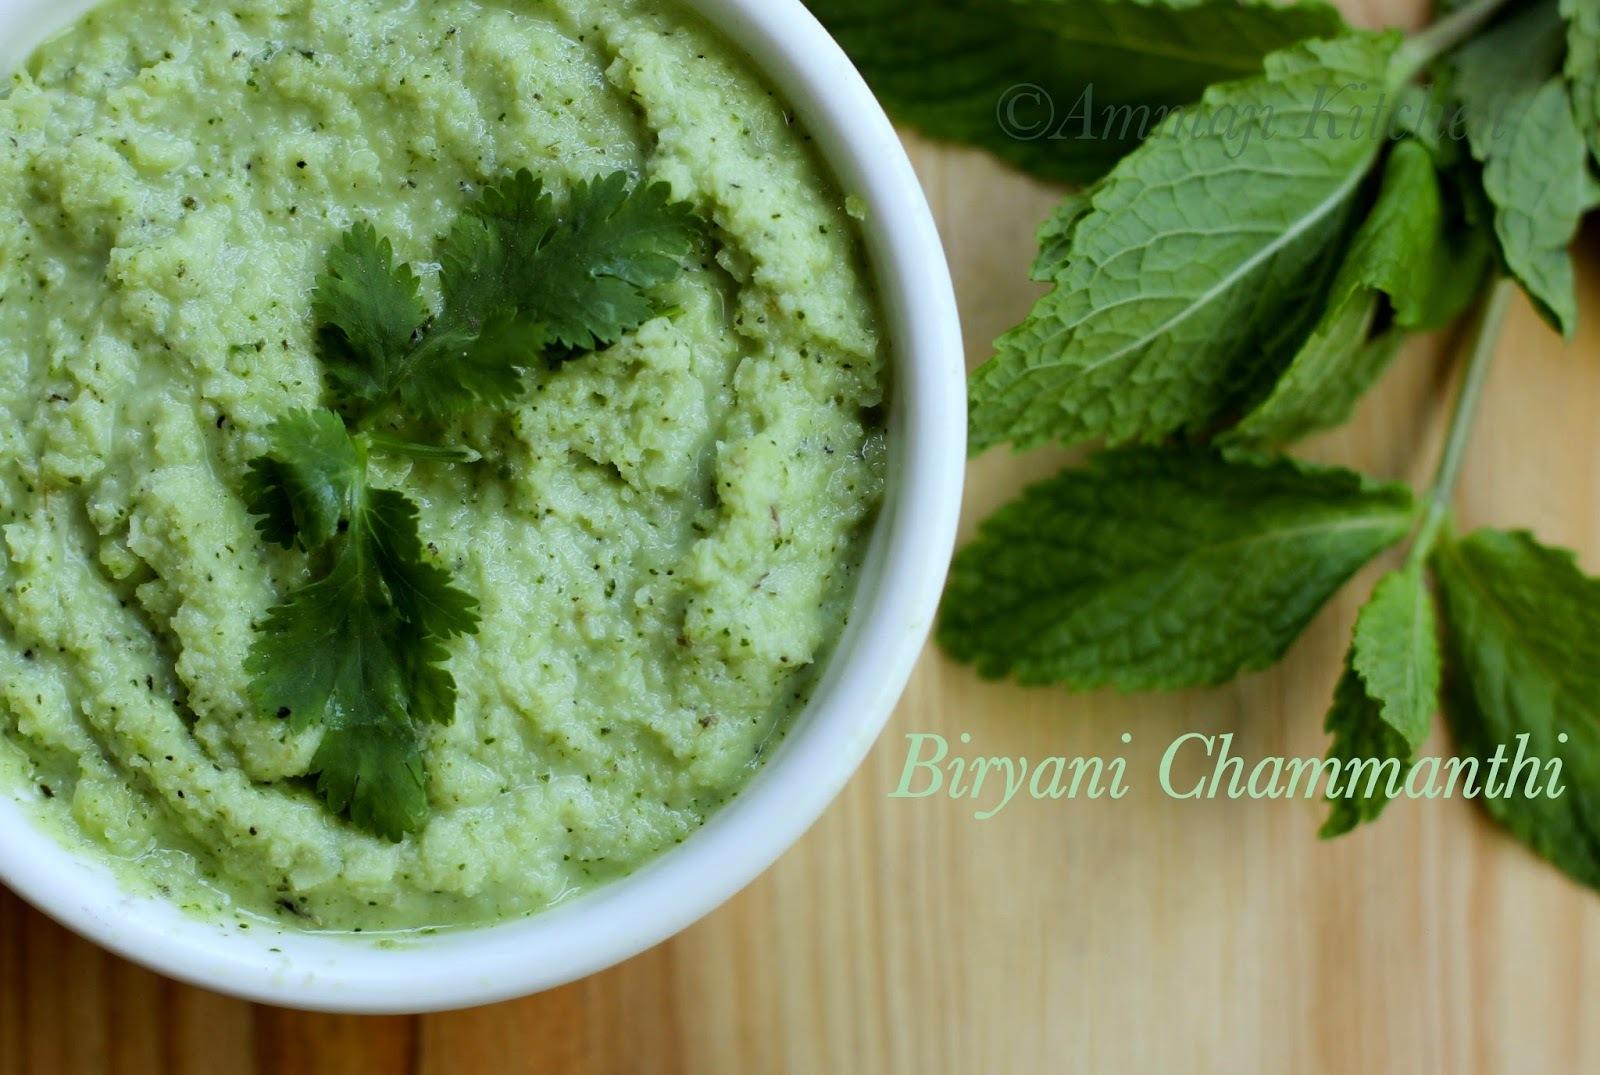 Biryani Chammanthi | Green Coconut Chutney